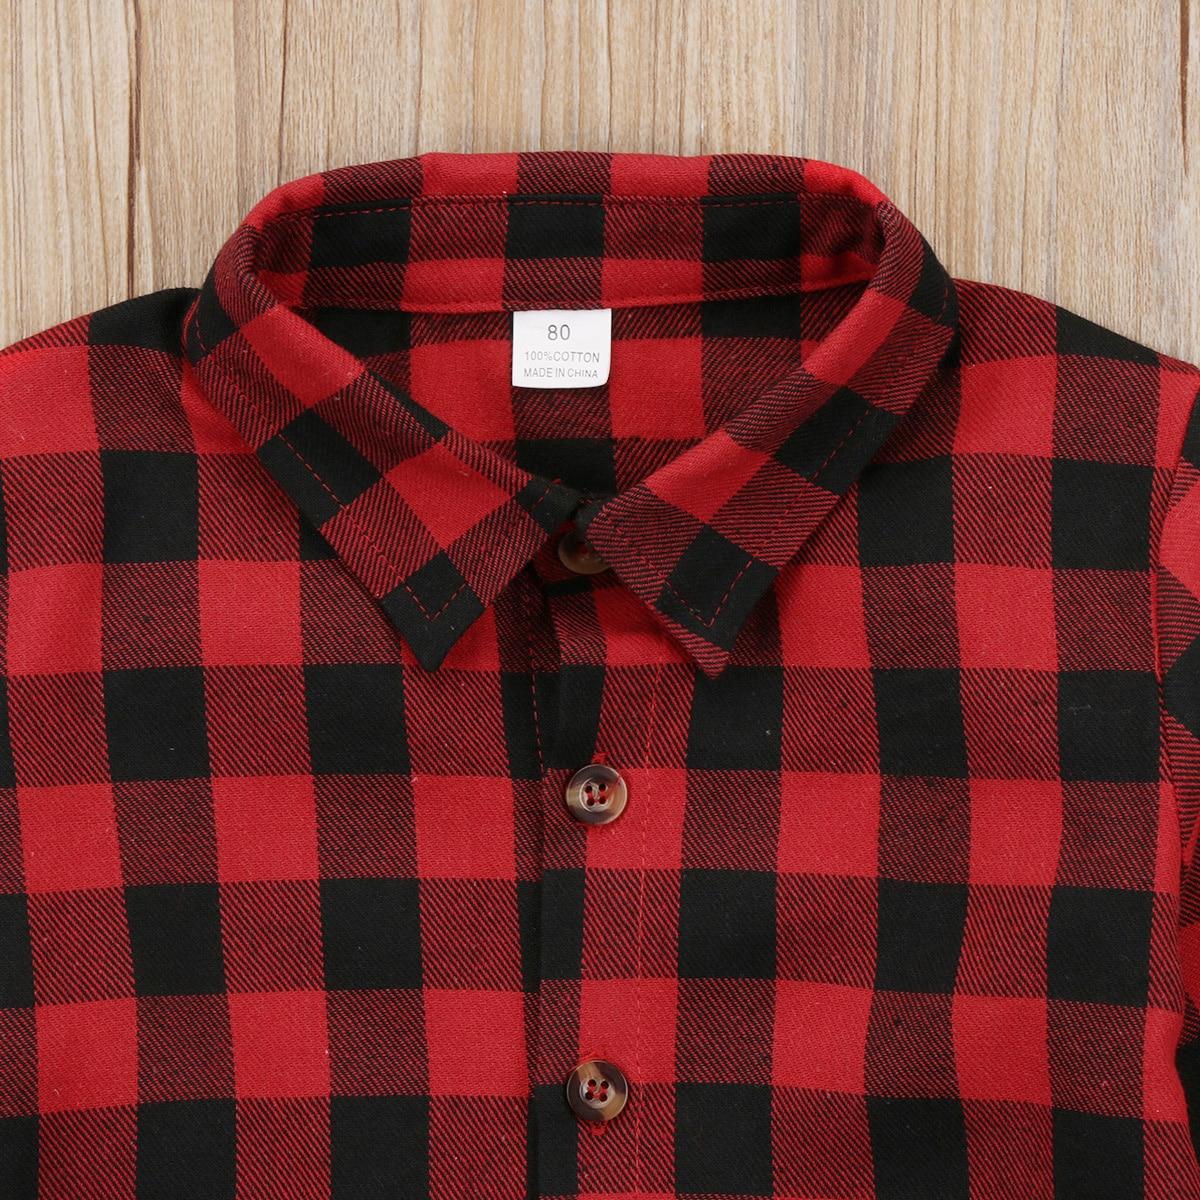 Boys Girls Long Sleeve Plaid Shirt Tops Kids Button Down Cotton Flannel Shirt